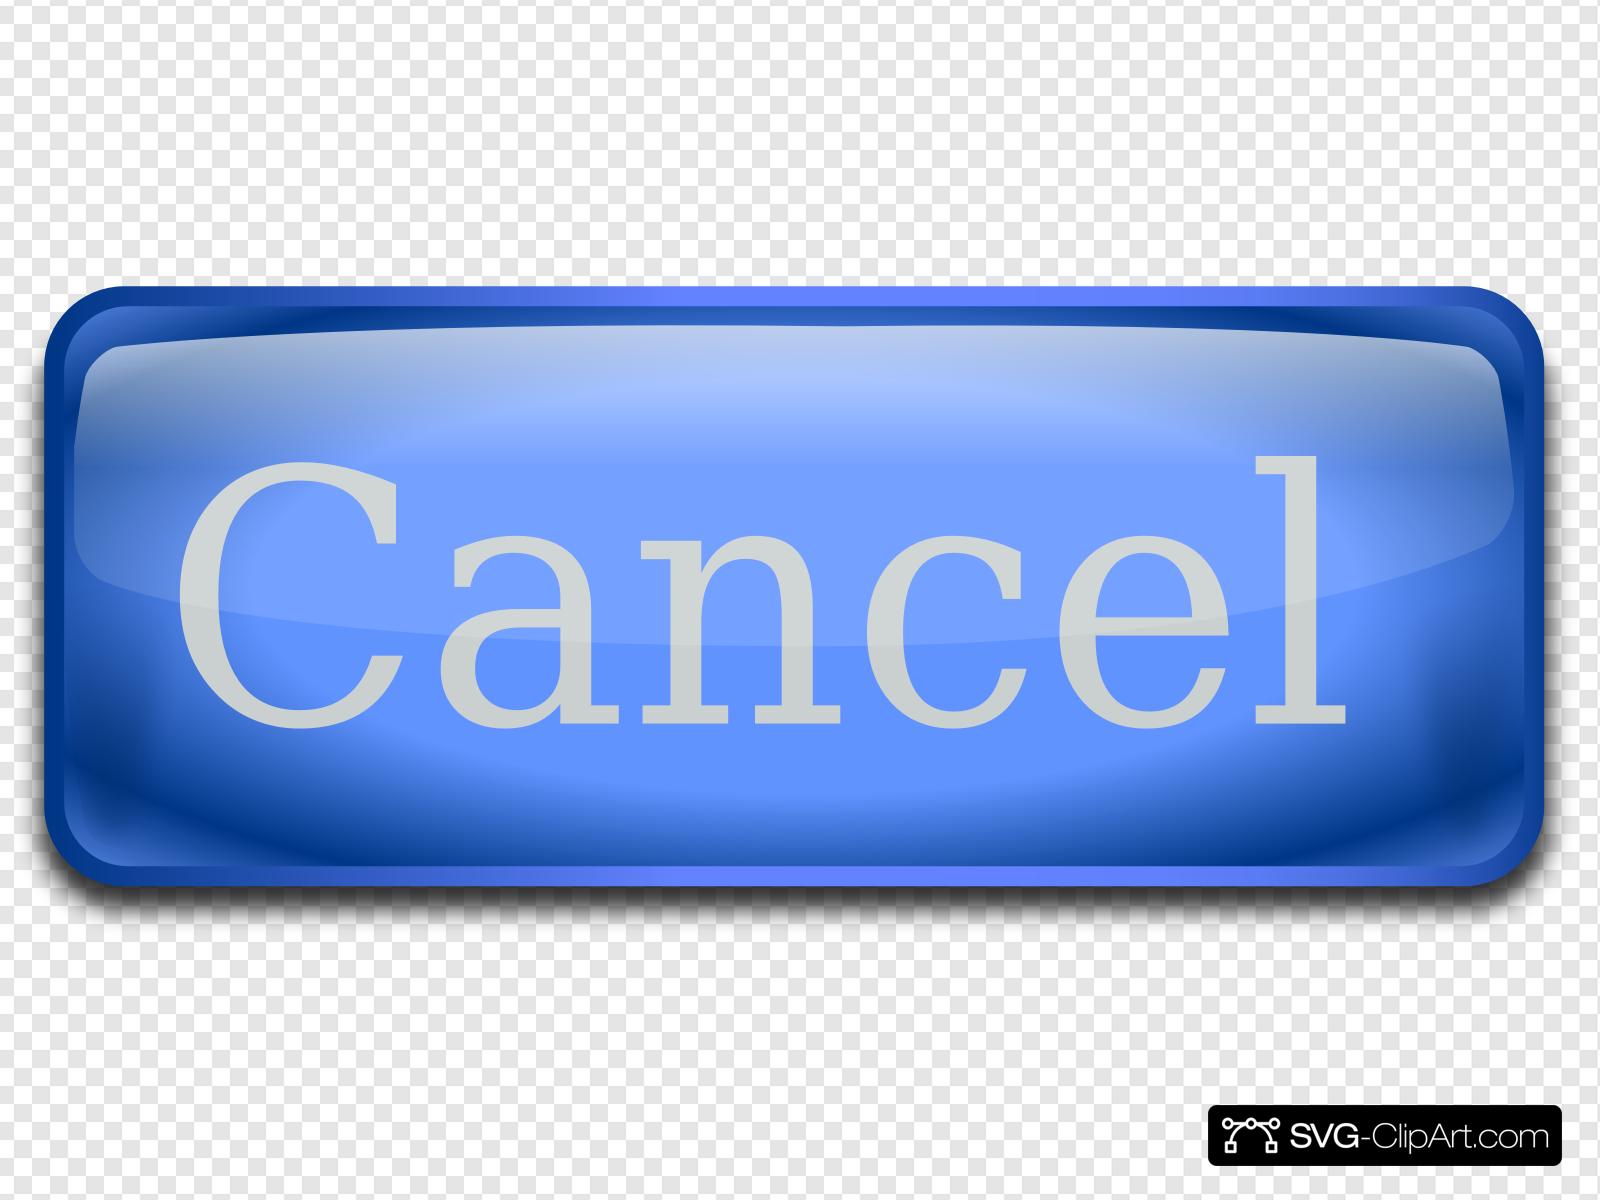 Cancel Button Clip art, Icon and SVG.